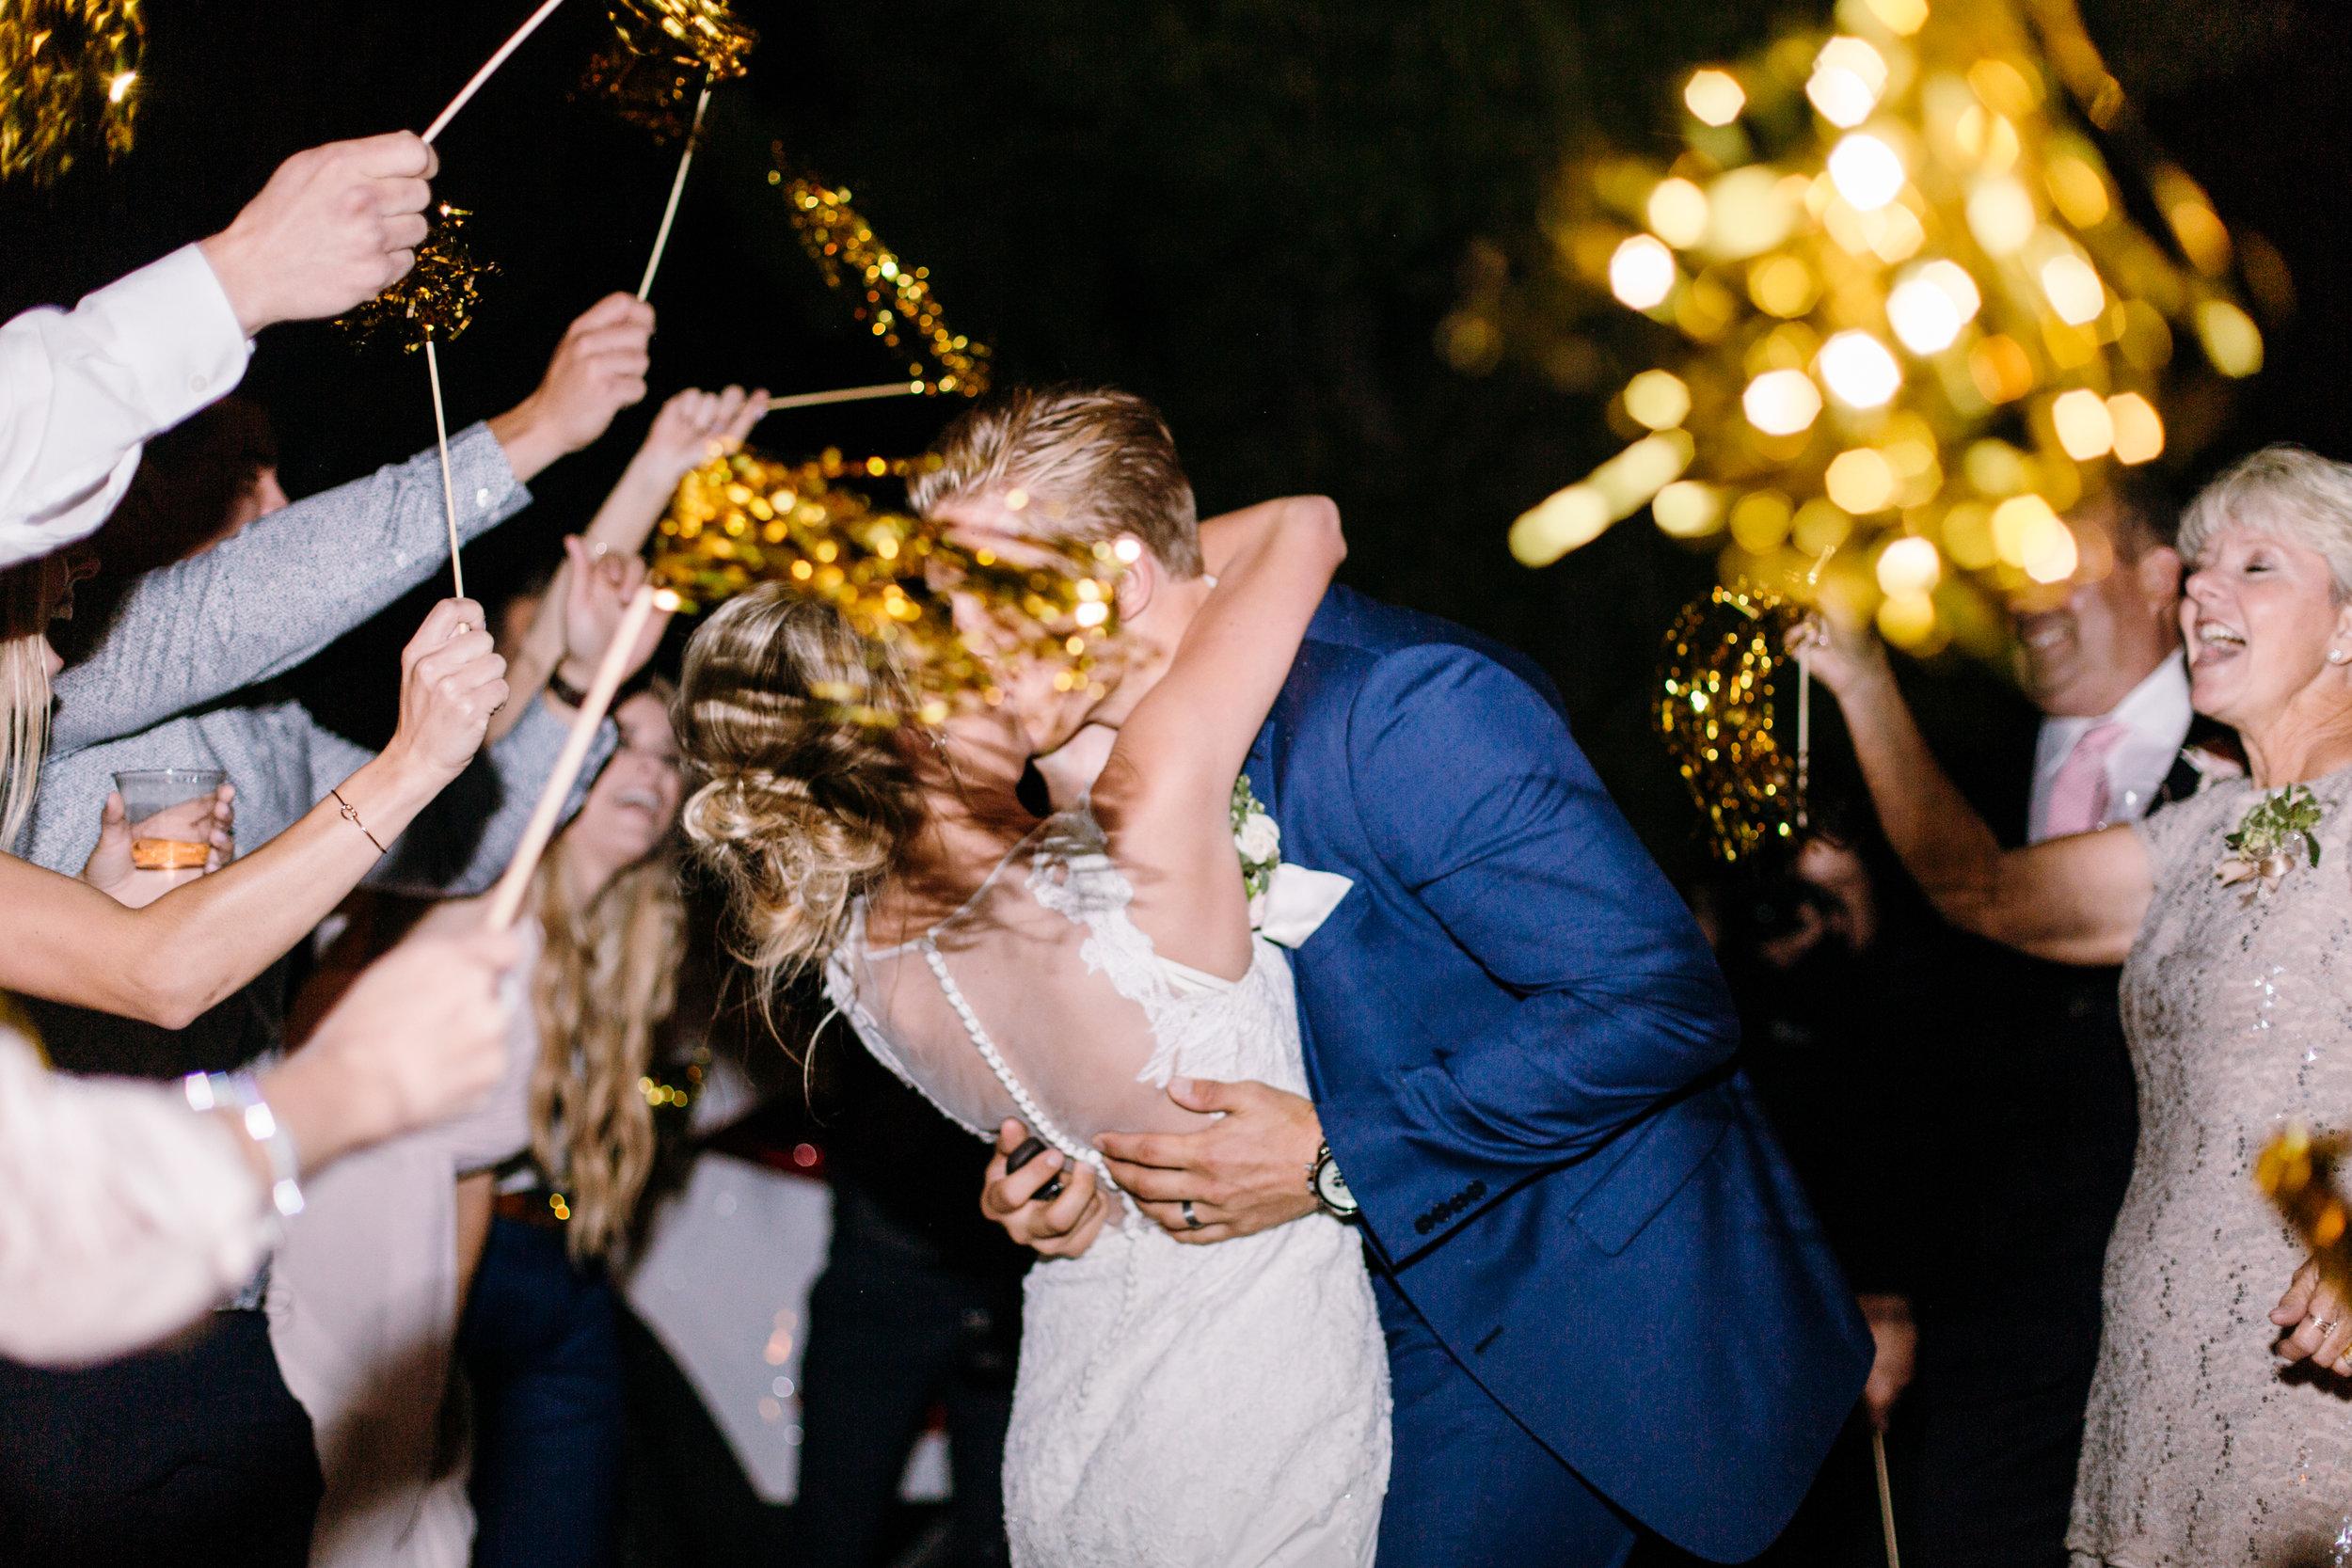 KaraNixonWeddings-LakeOakMeadows-Temecula-Wedding-60.jpg